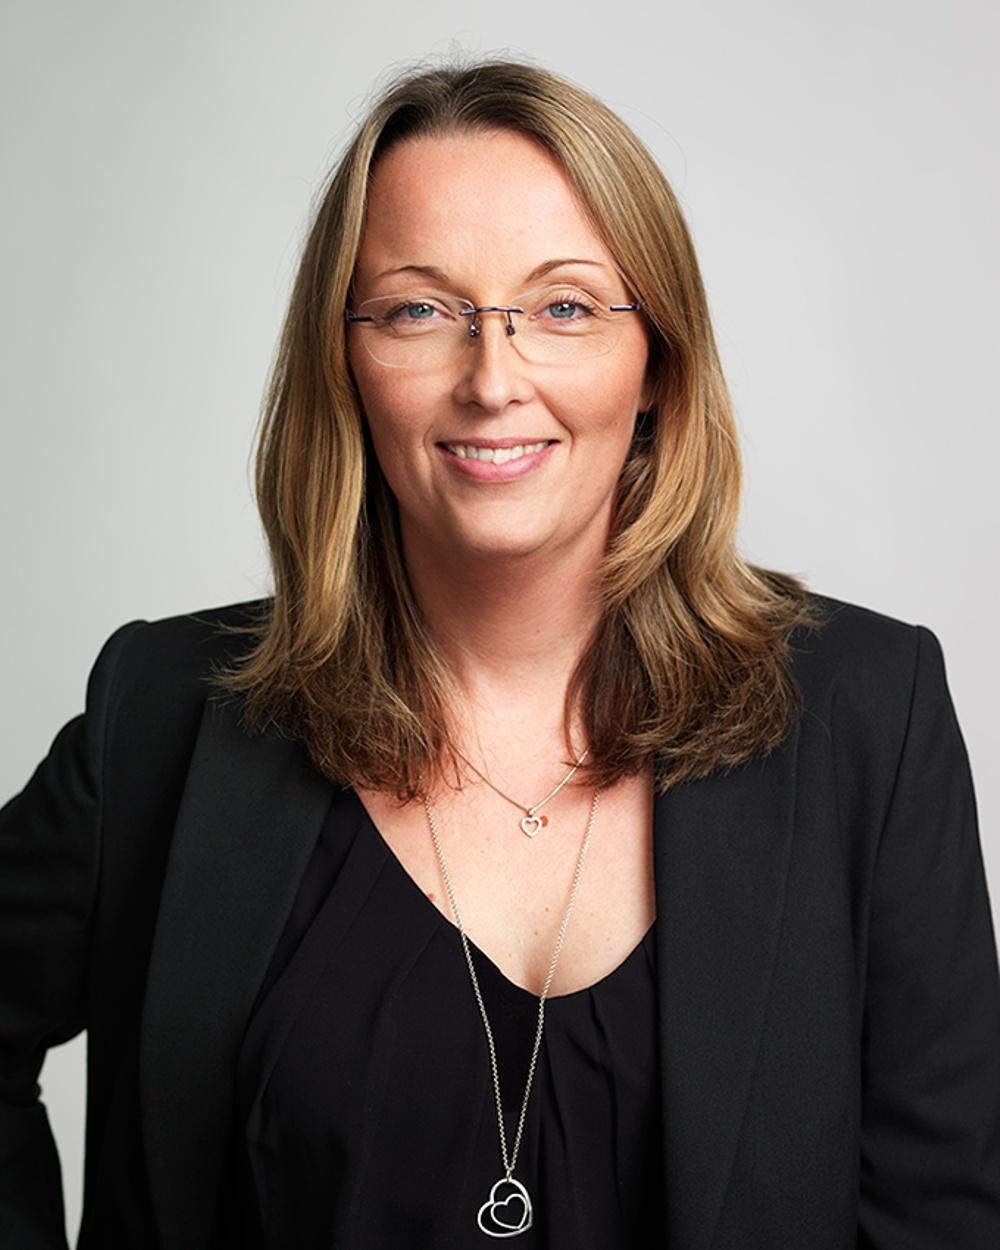 Annette-Hult-Bankgirot